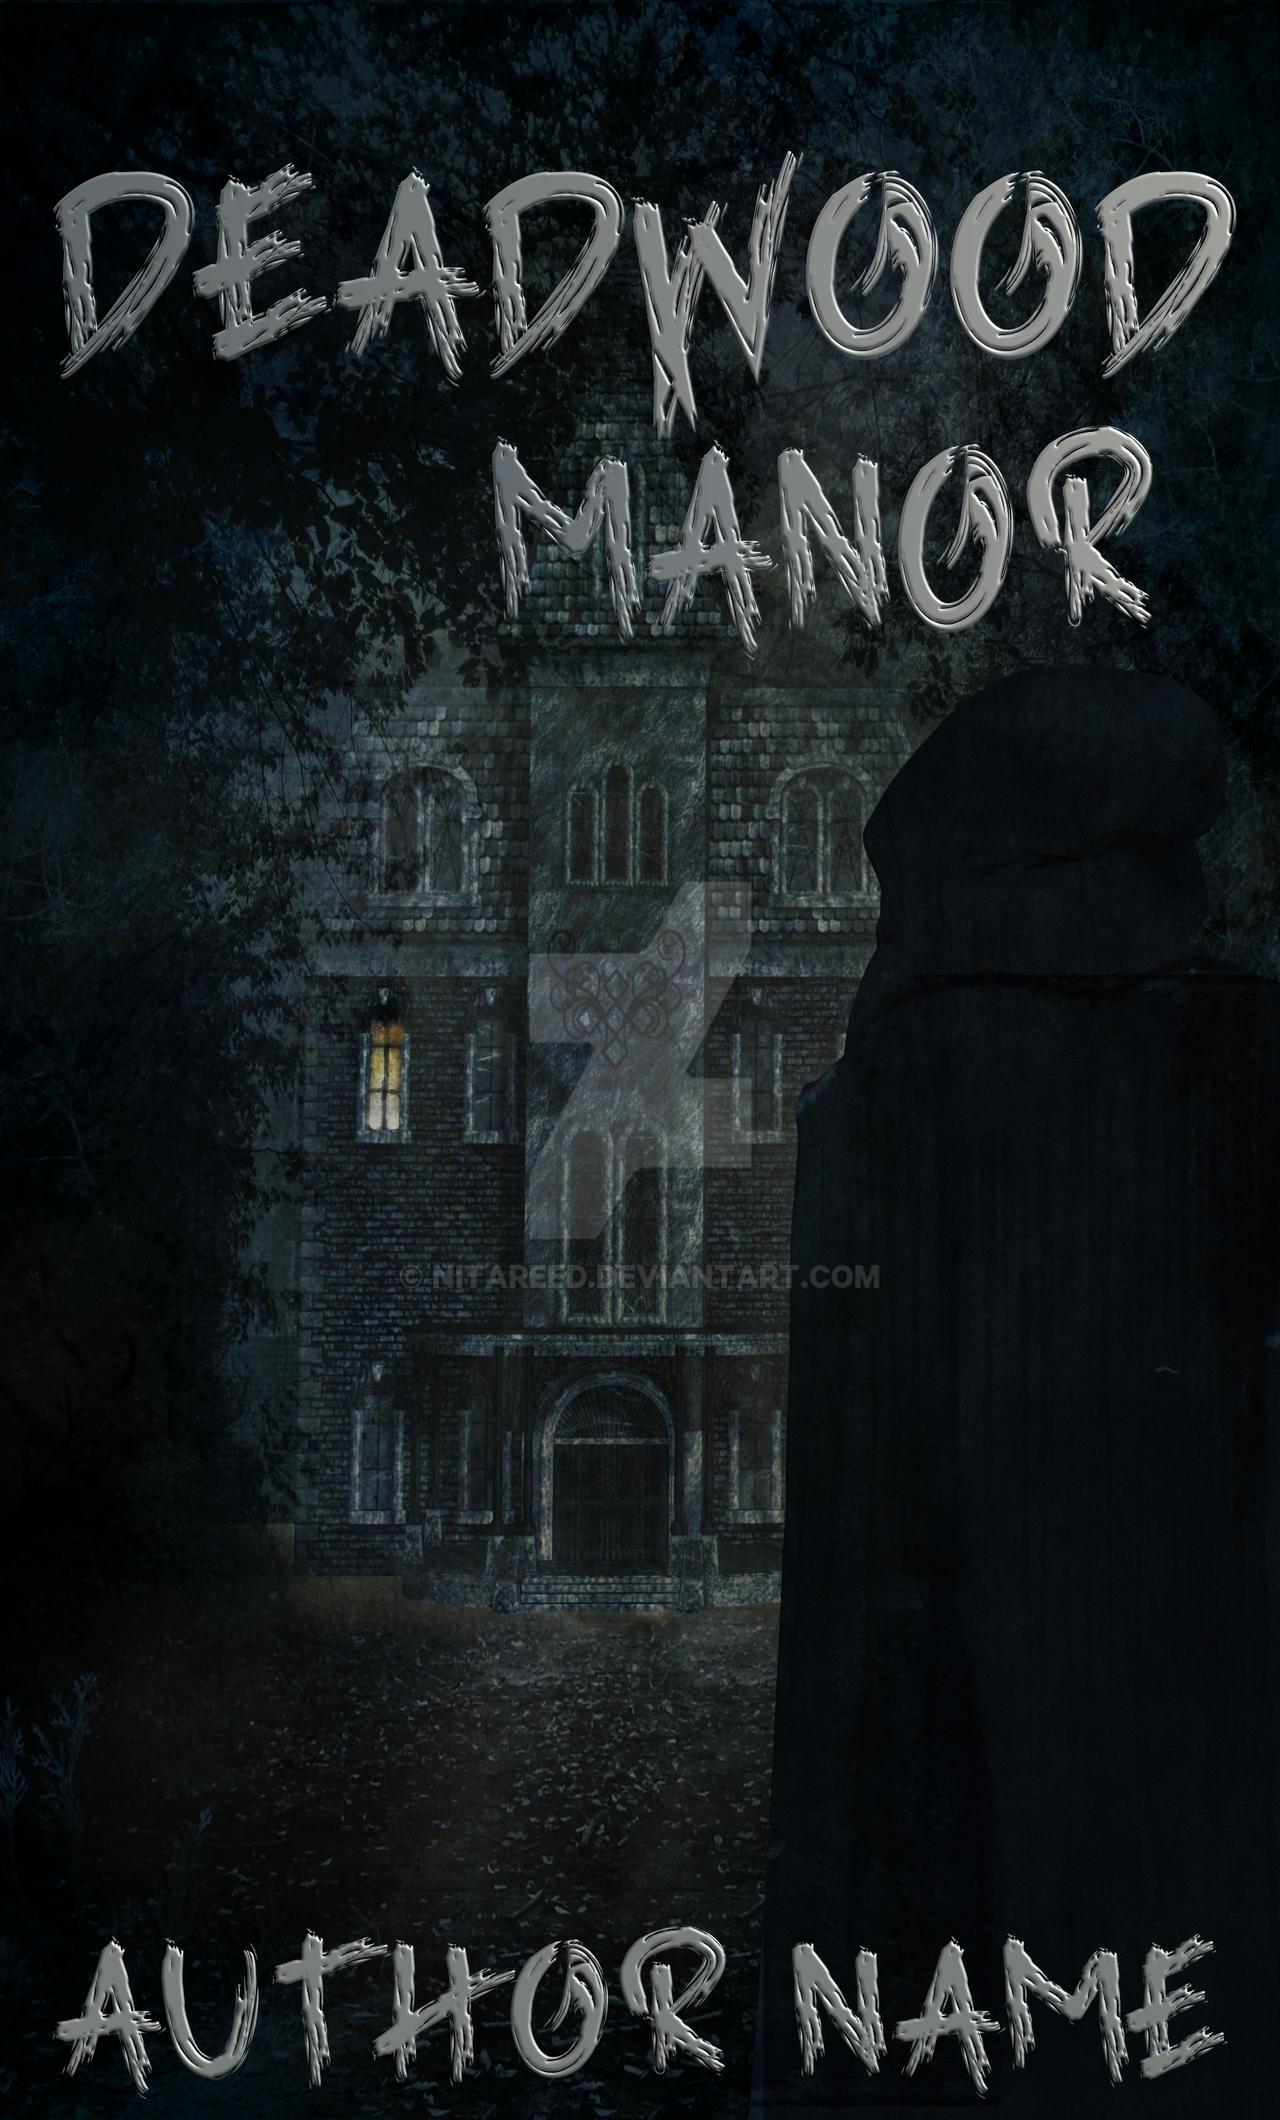 Deadwood Manor